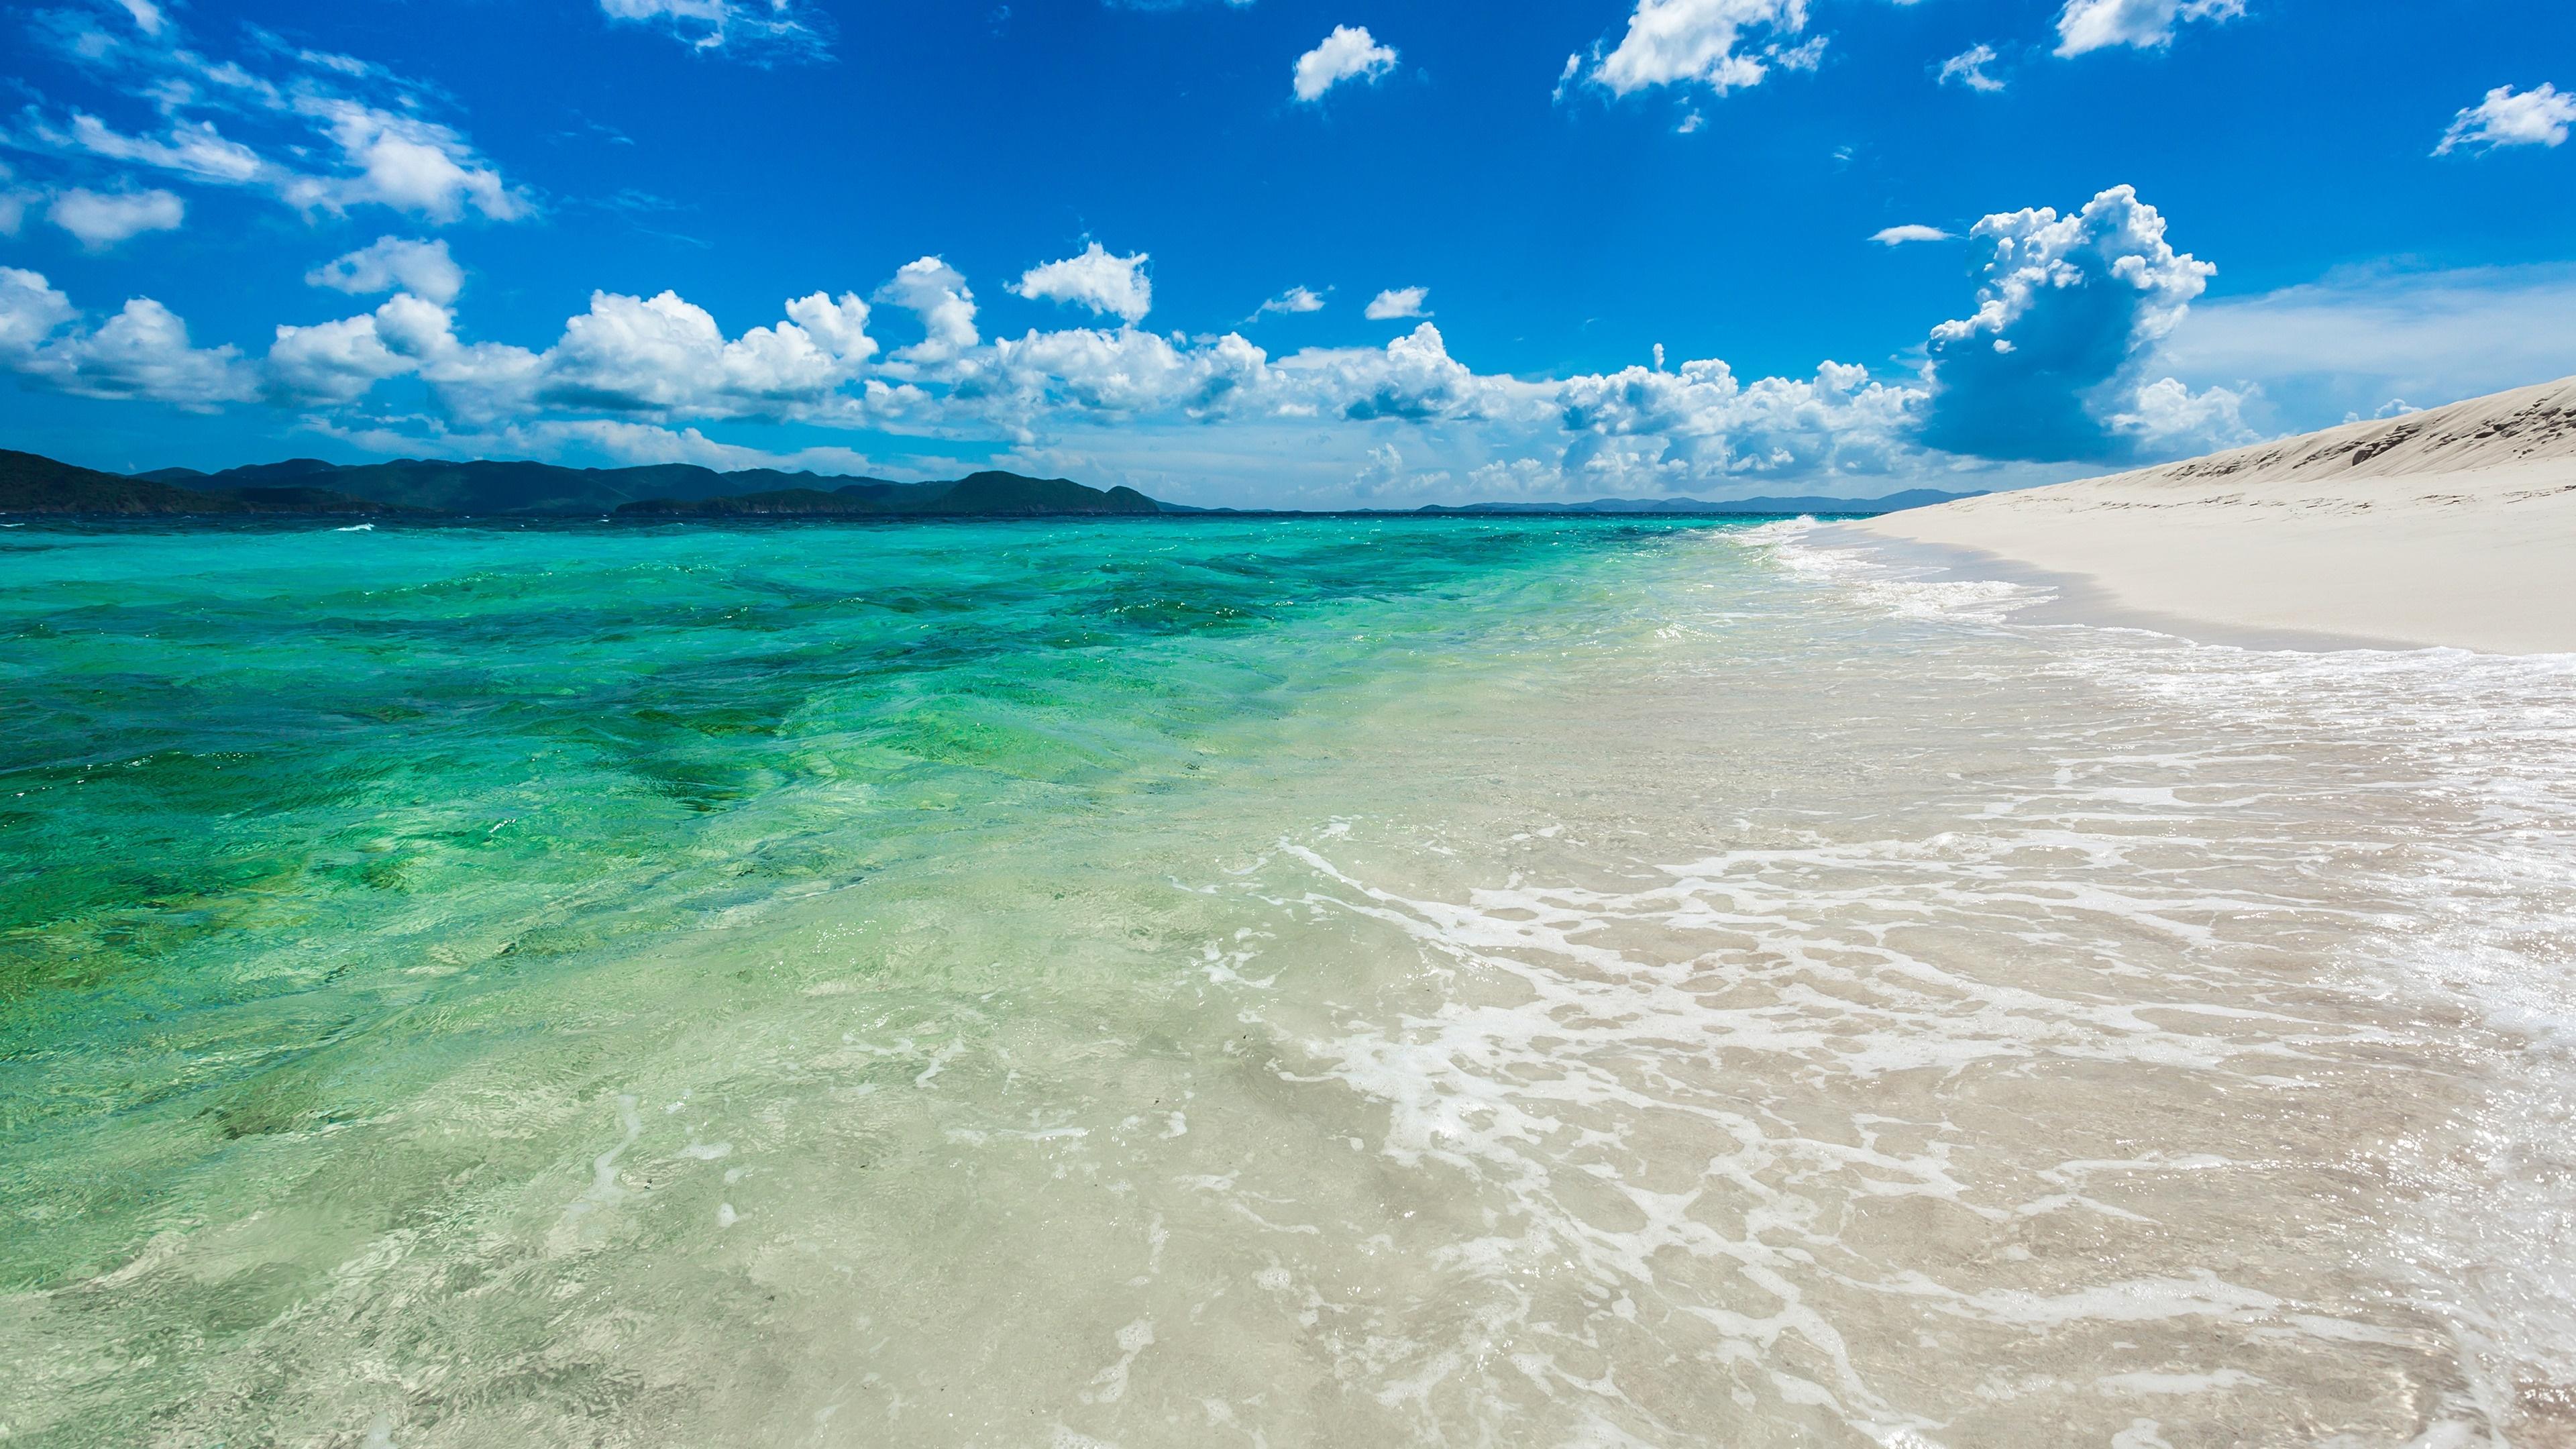 Beautiful beachside in Hawaii wallpaper